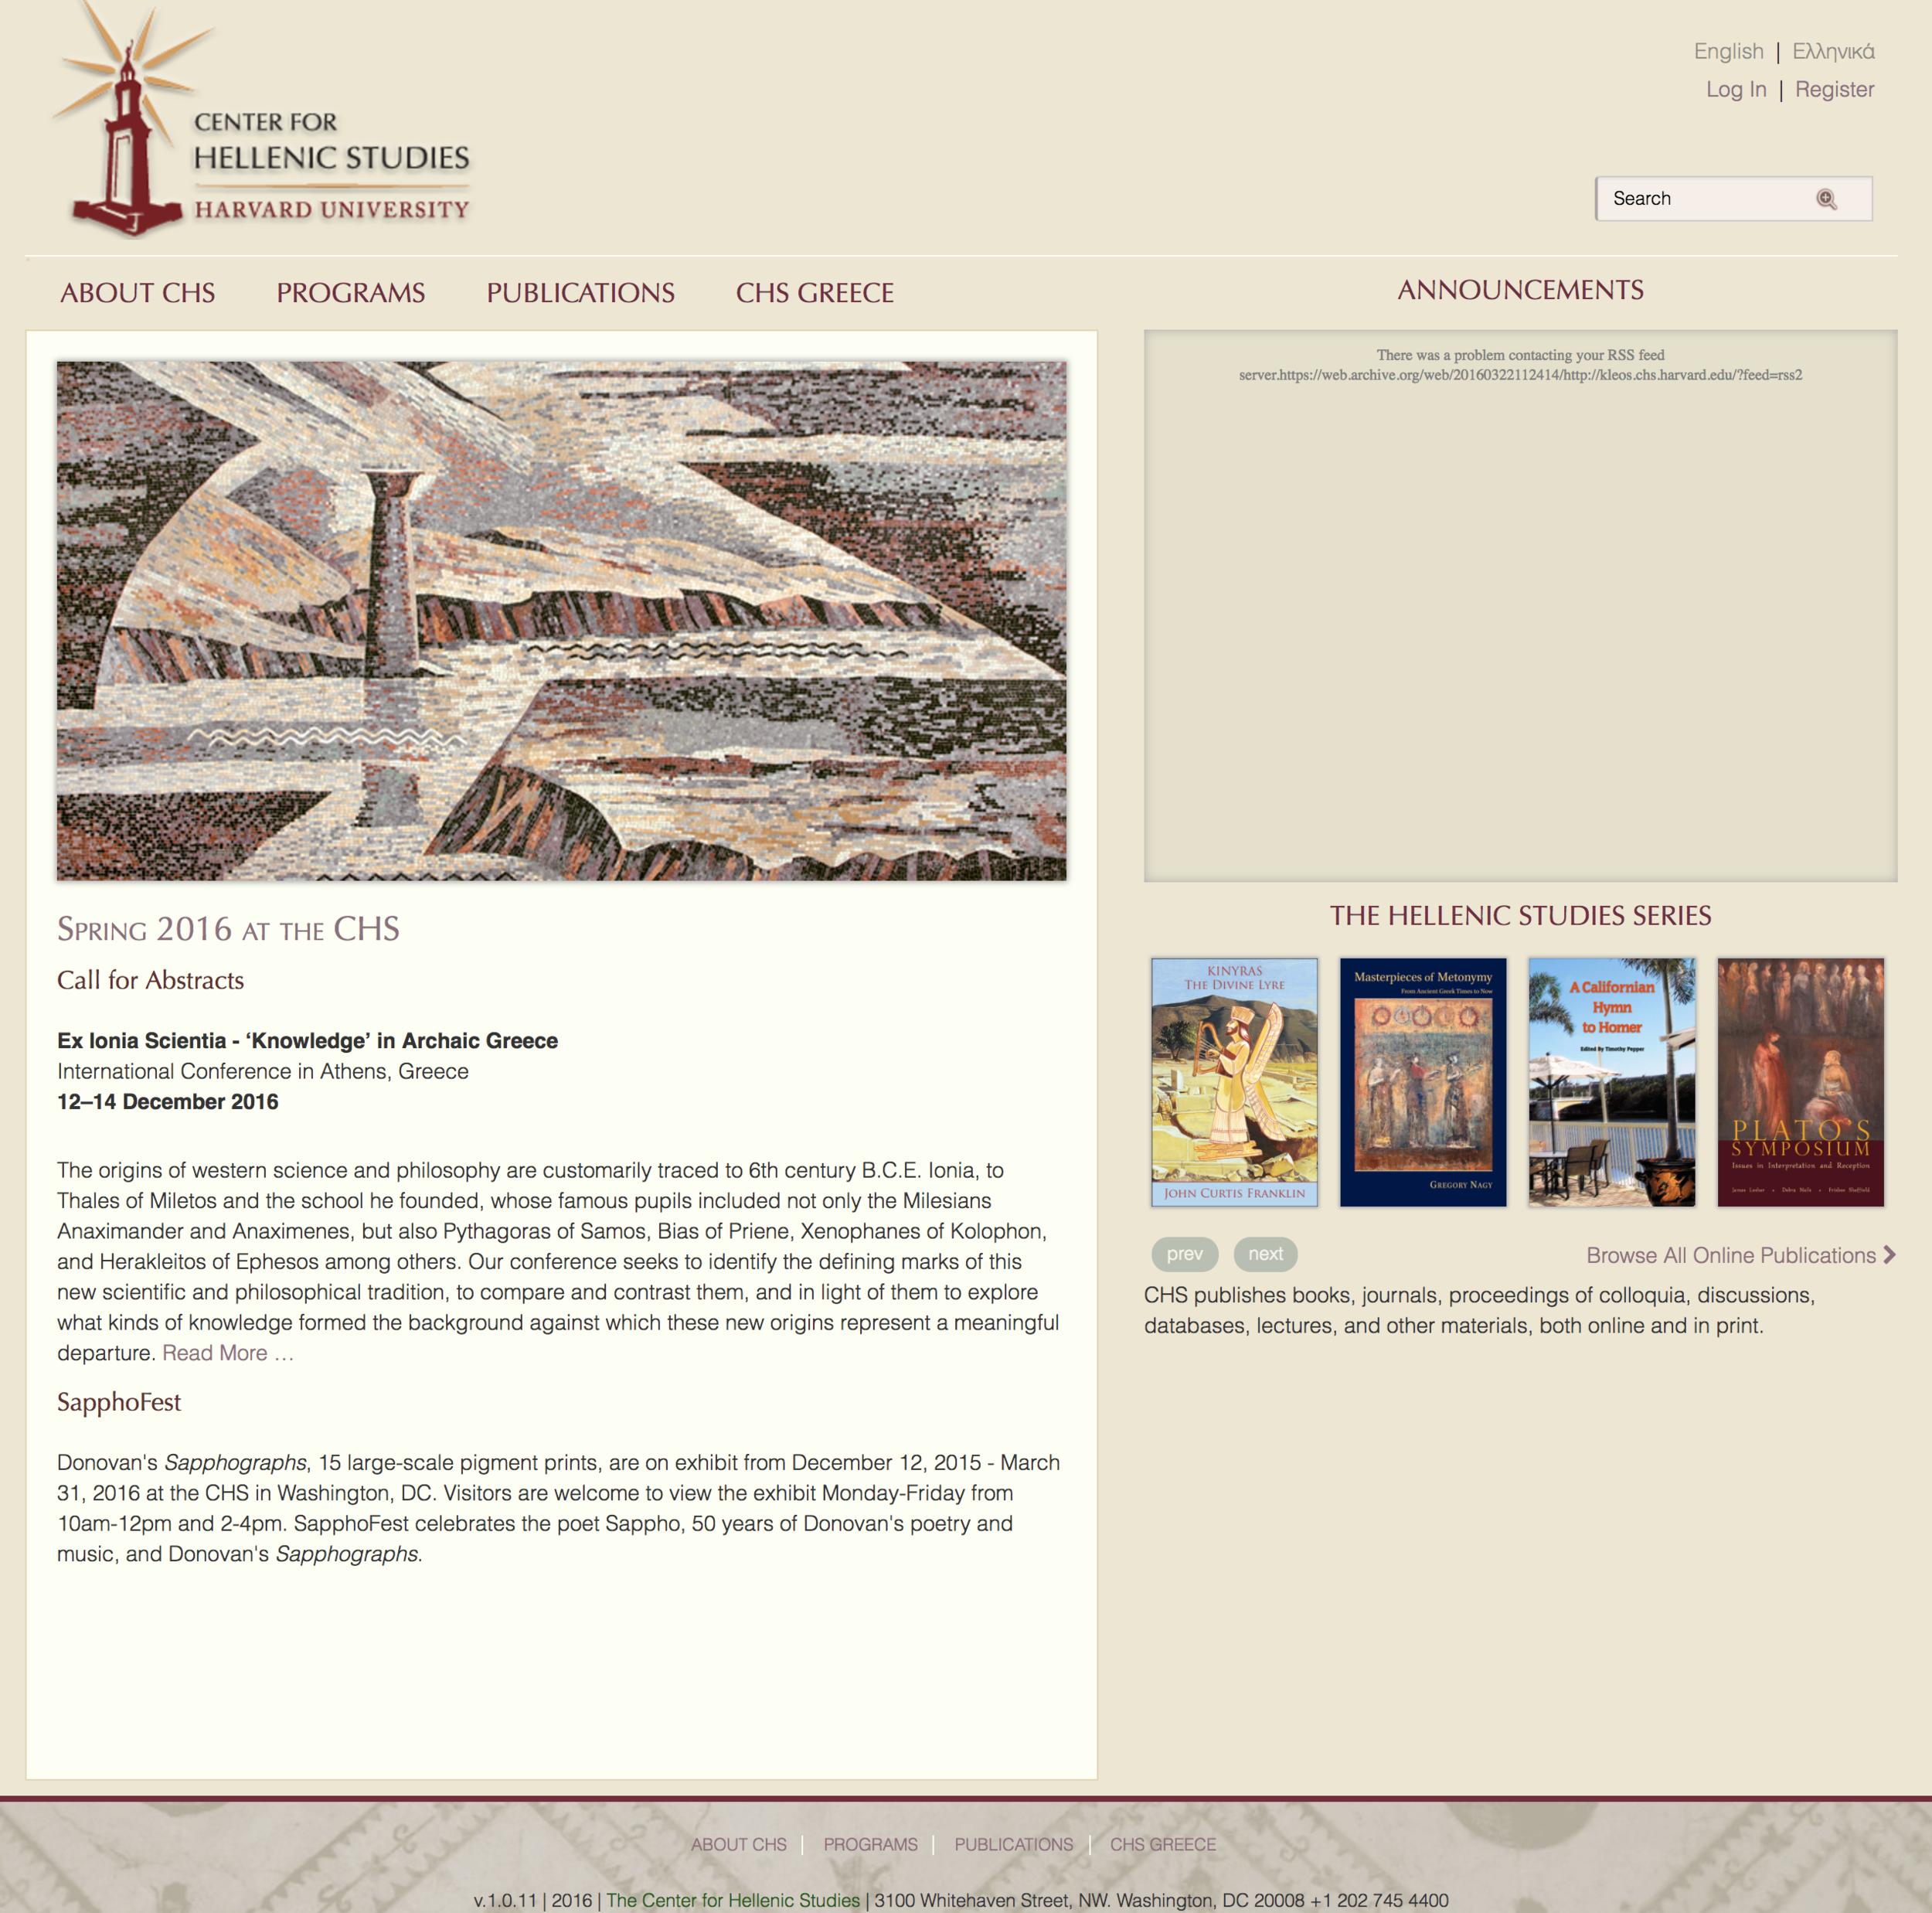 screencapture-web-archive-org-web-20160322112414-https-chs-harvard-edu-1504057477798.png